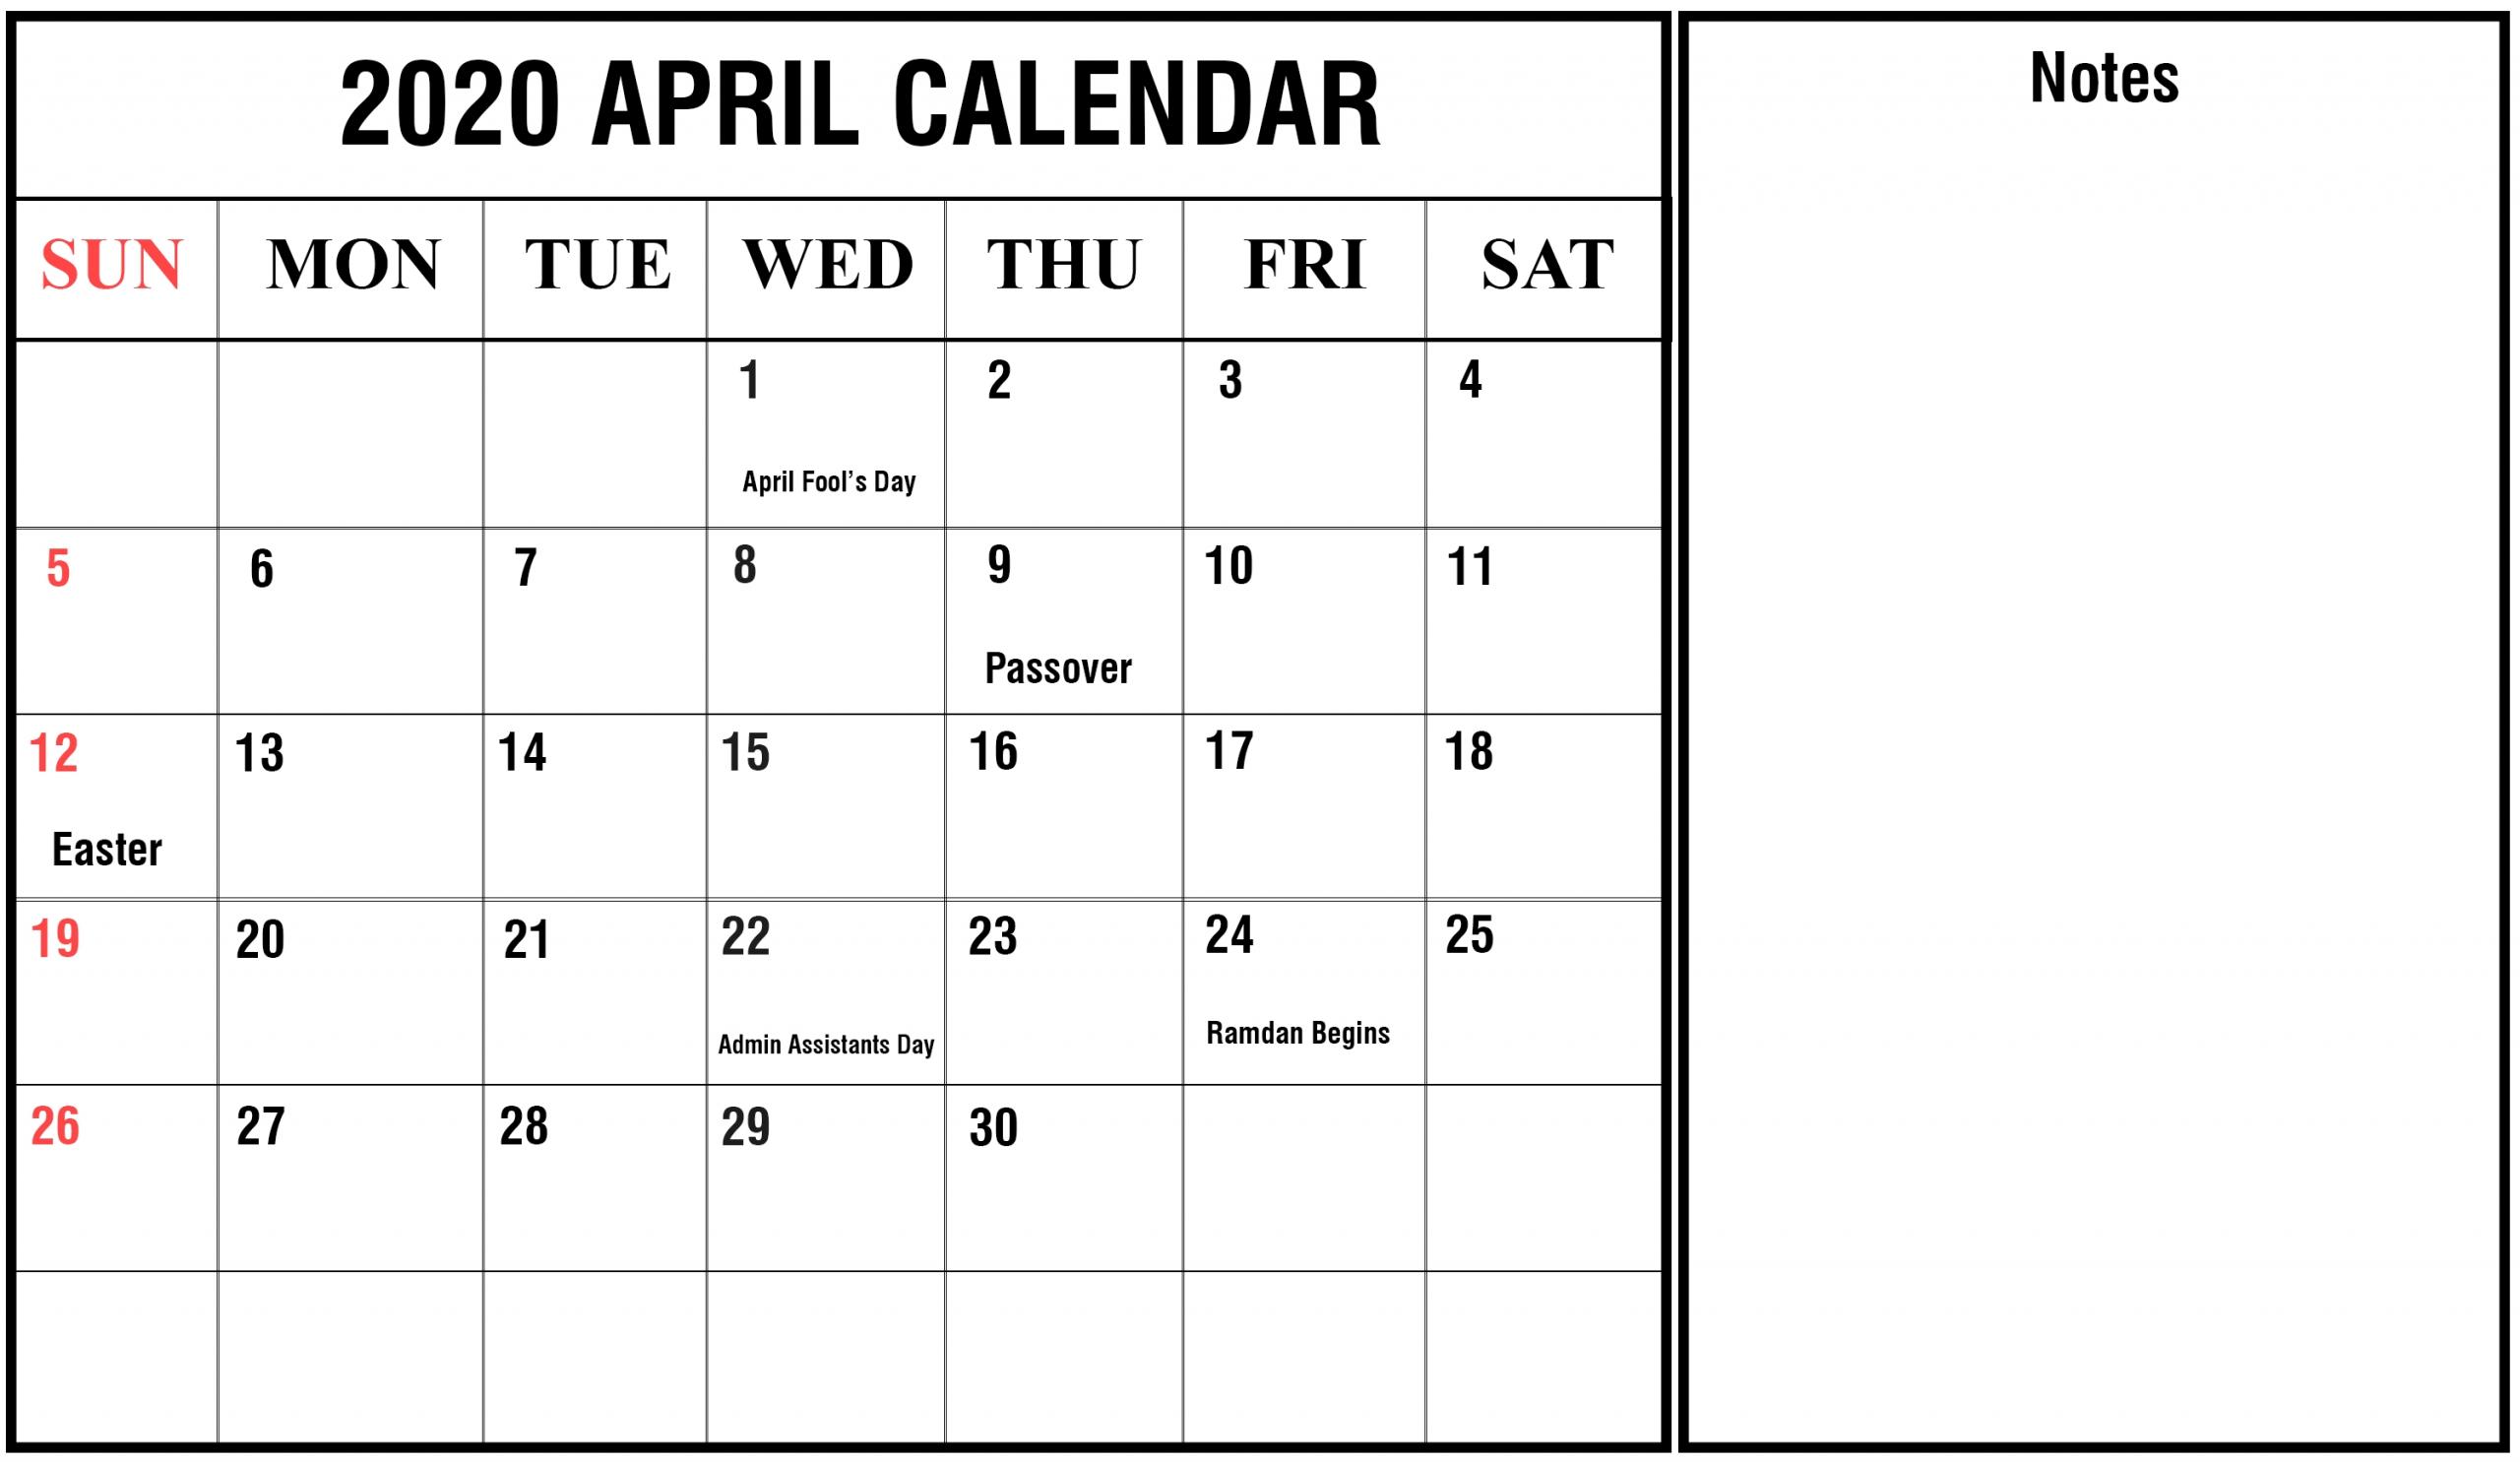 Free Blank April Calendar 2020 Printable Template Editable